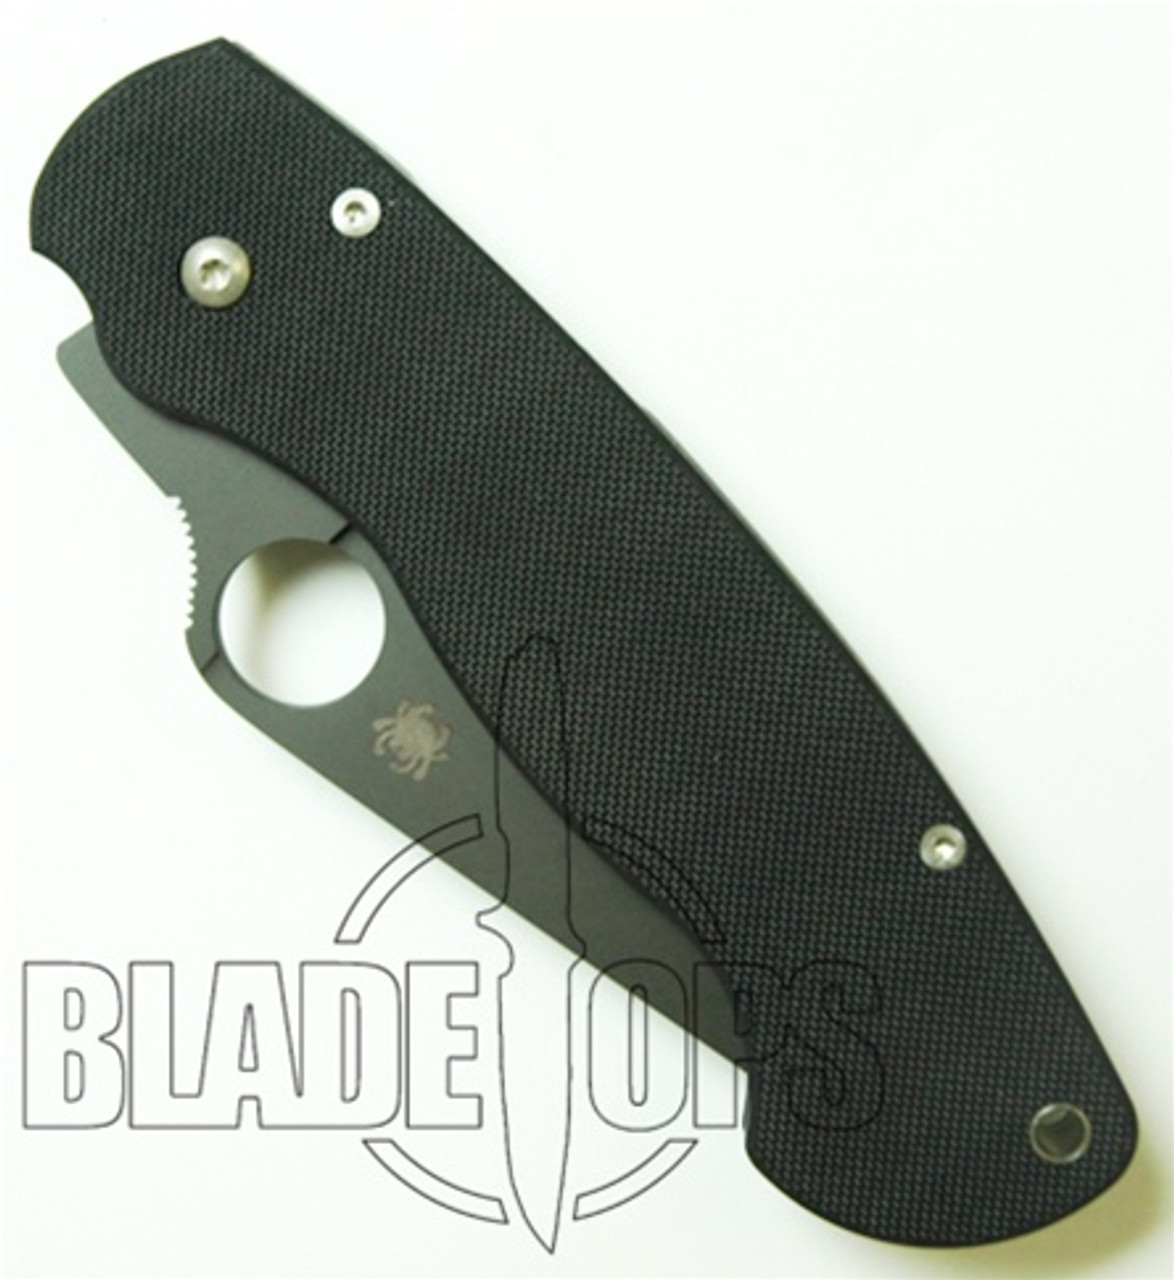 Spyderco Para-Military Manual Folder Knife, Black Plain Edge, G10 Handle, 81GPBK